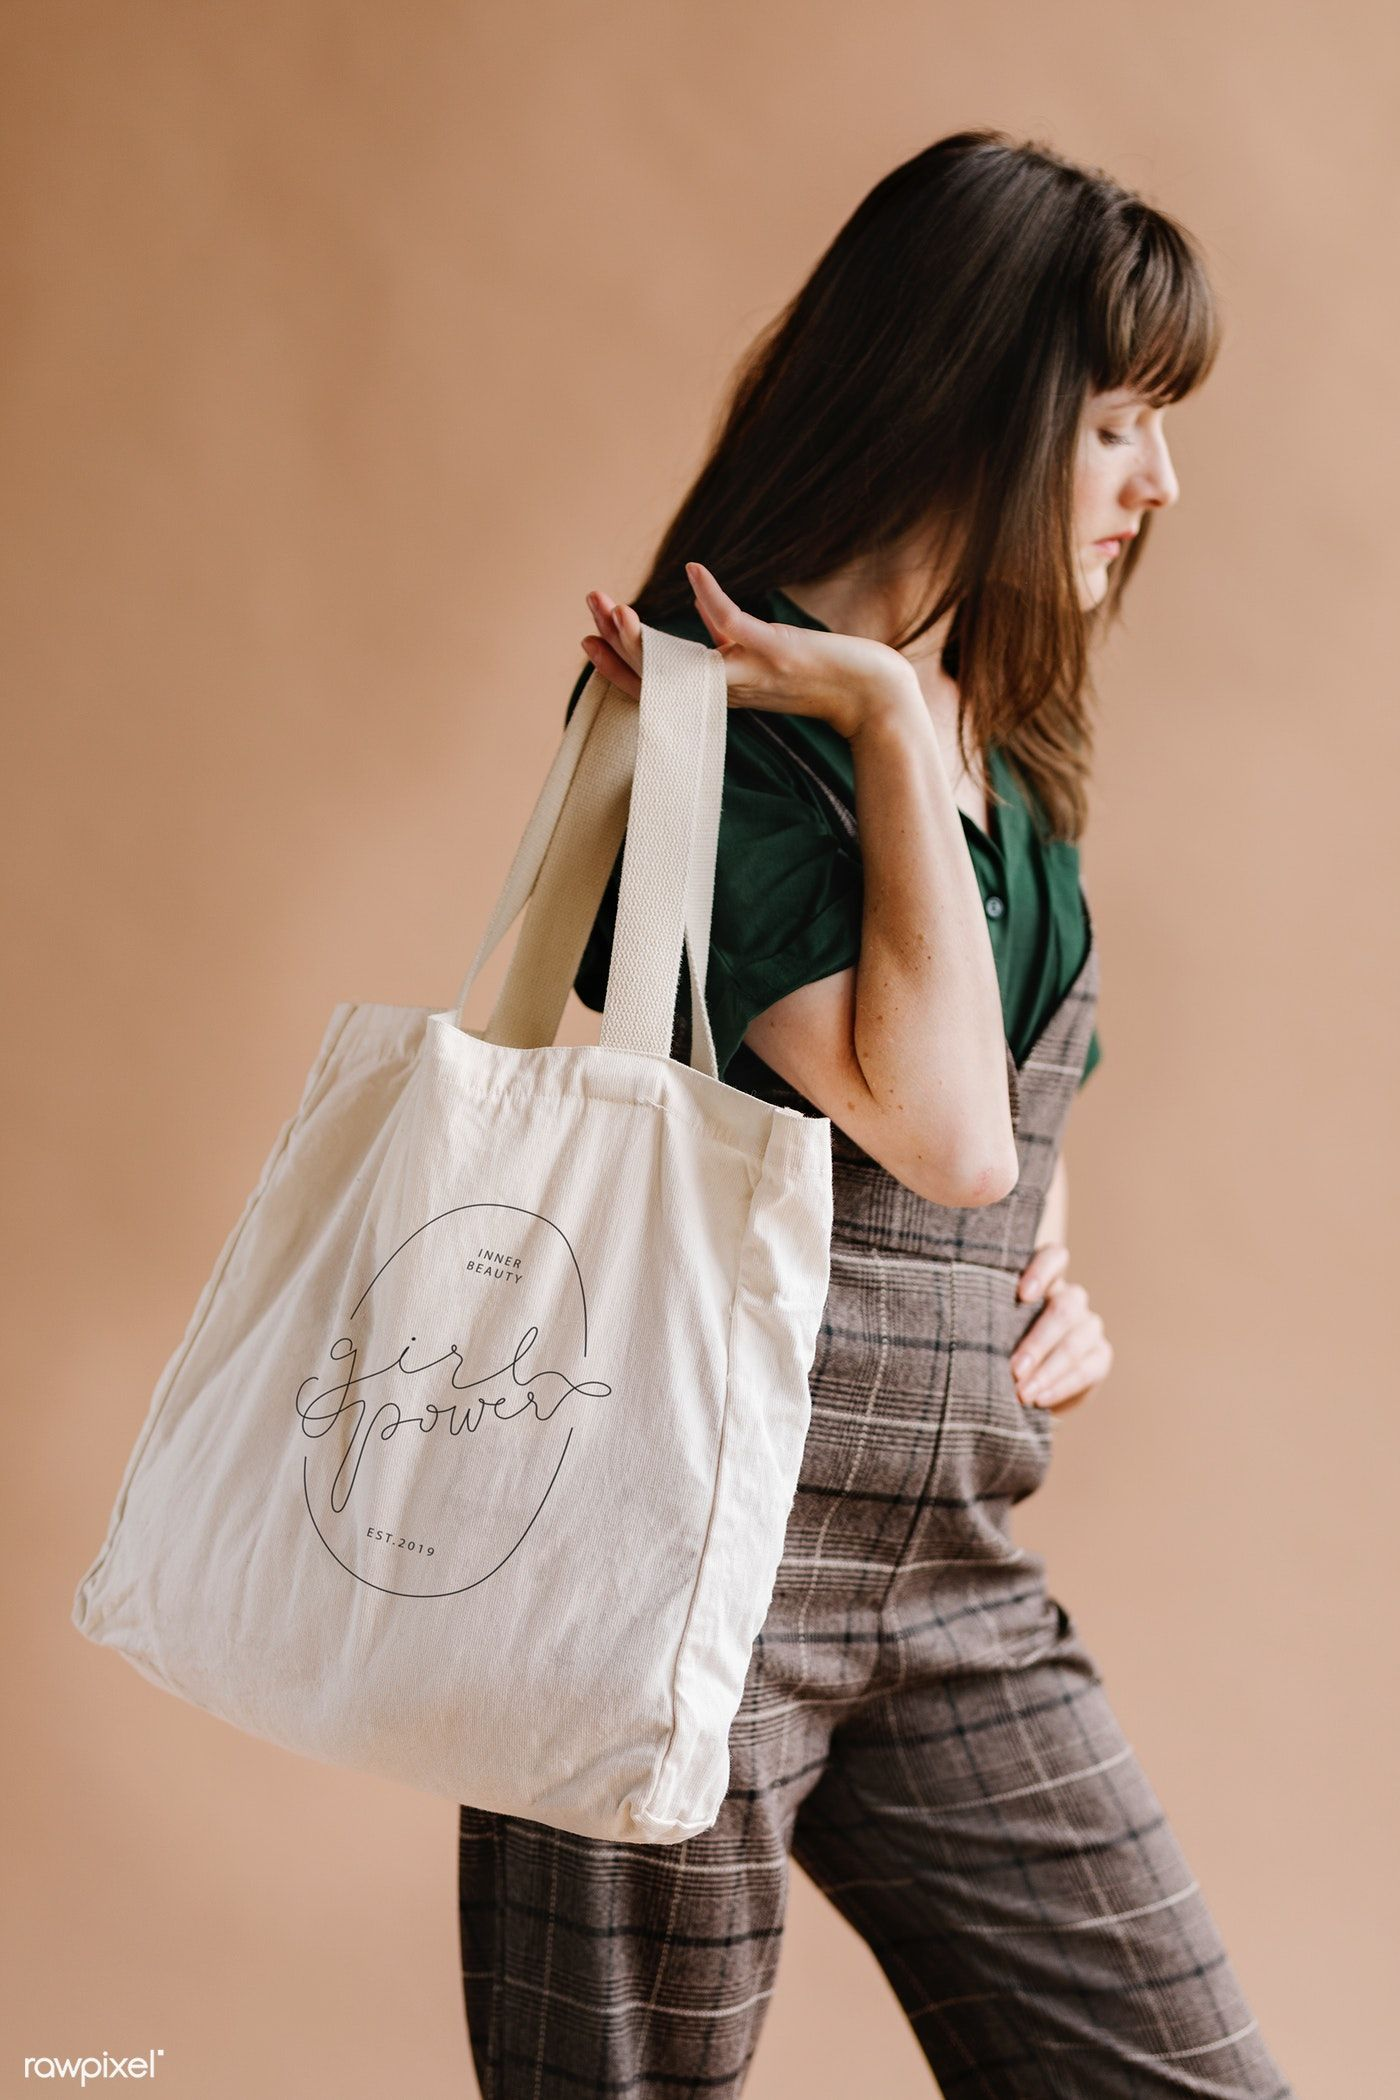 Download Download Premium Psd Of Woman With A Tote Bag Mockup 1235591 Brown Tote Bag Bag Mockup Real Leather Bags